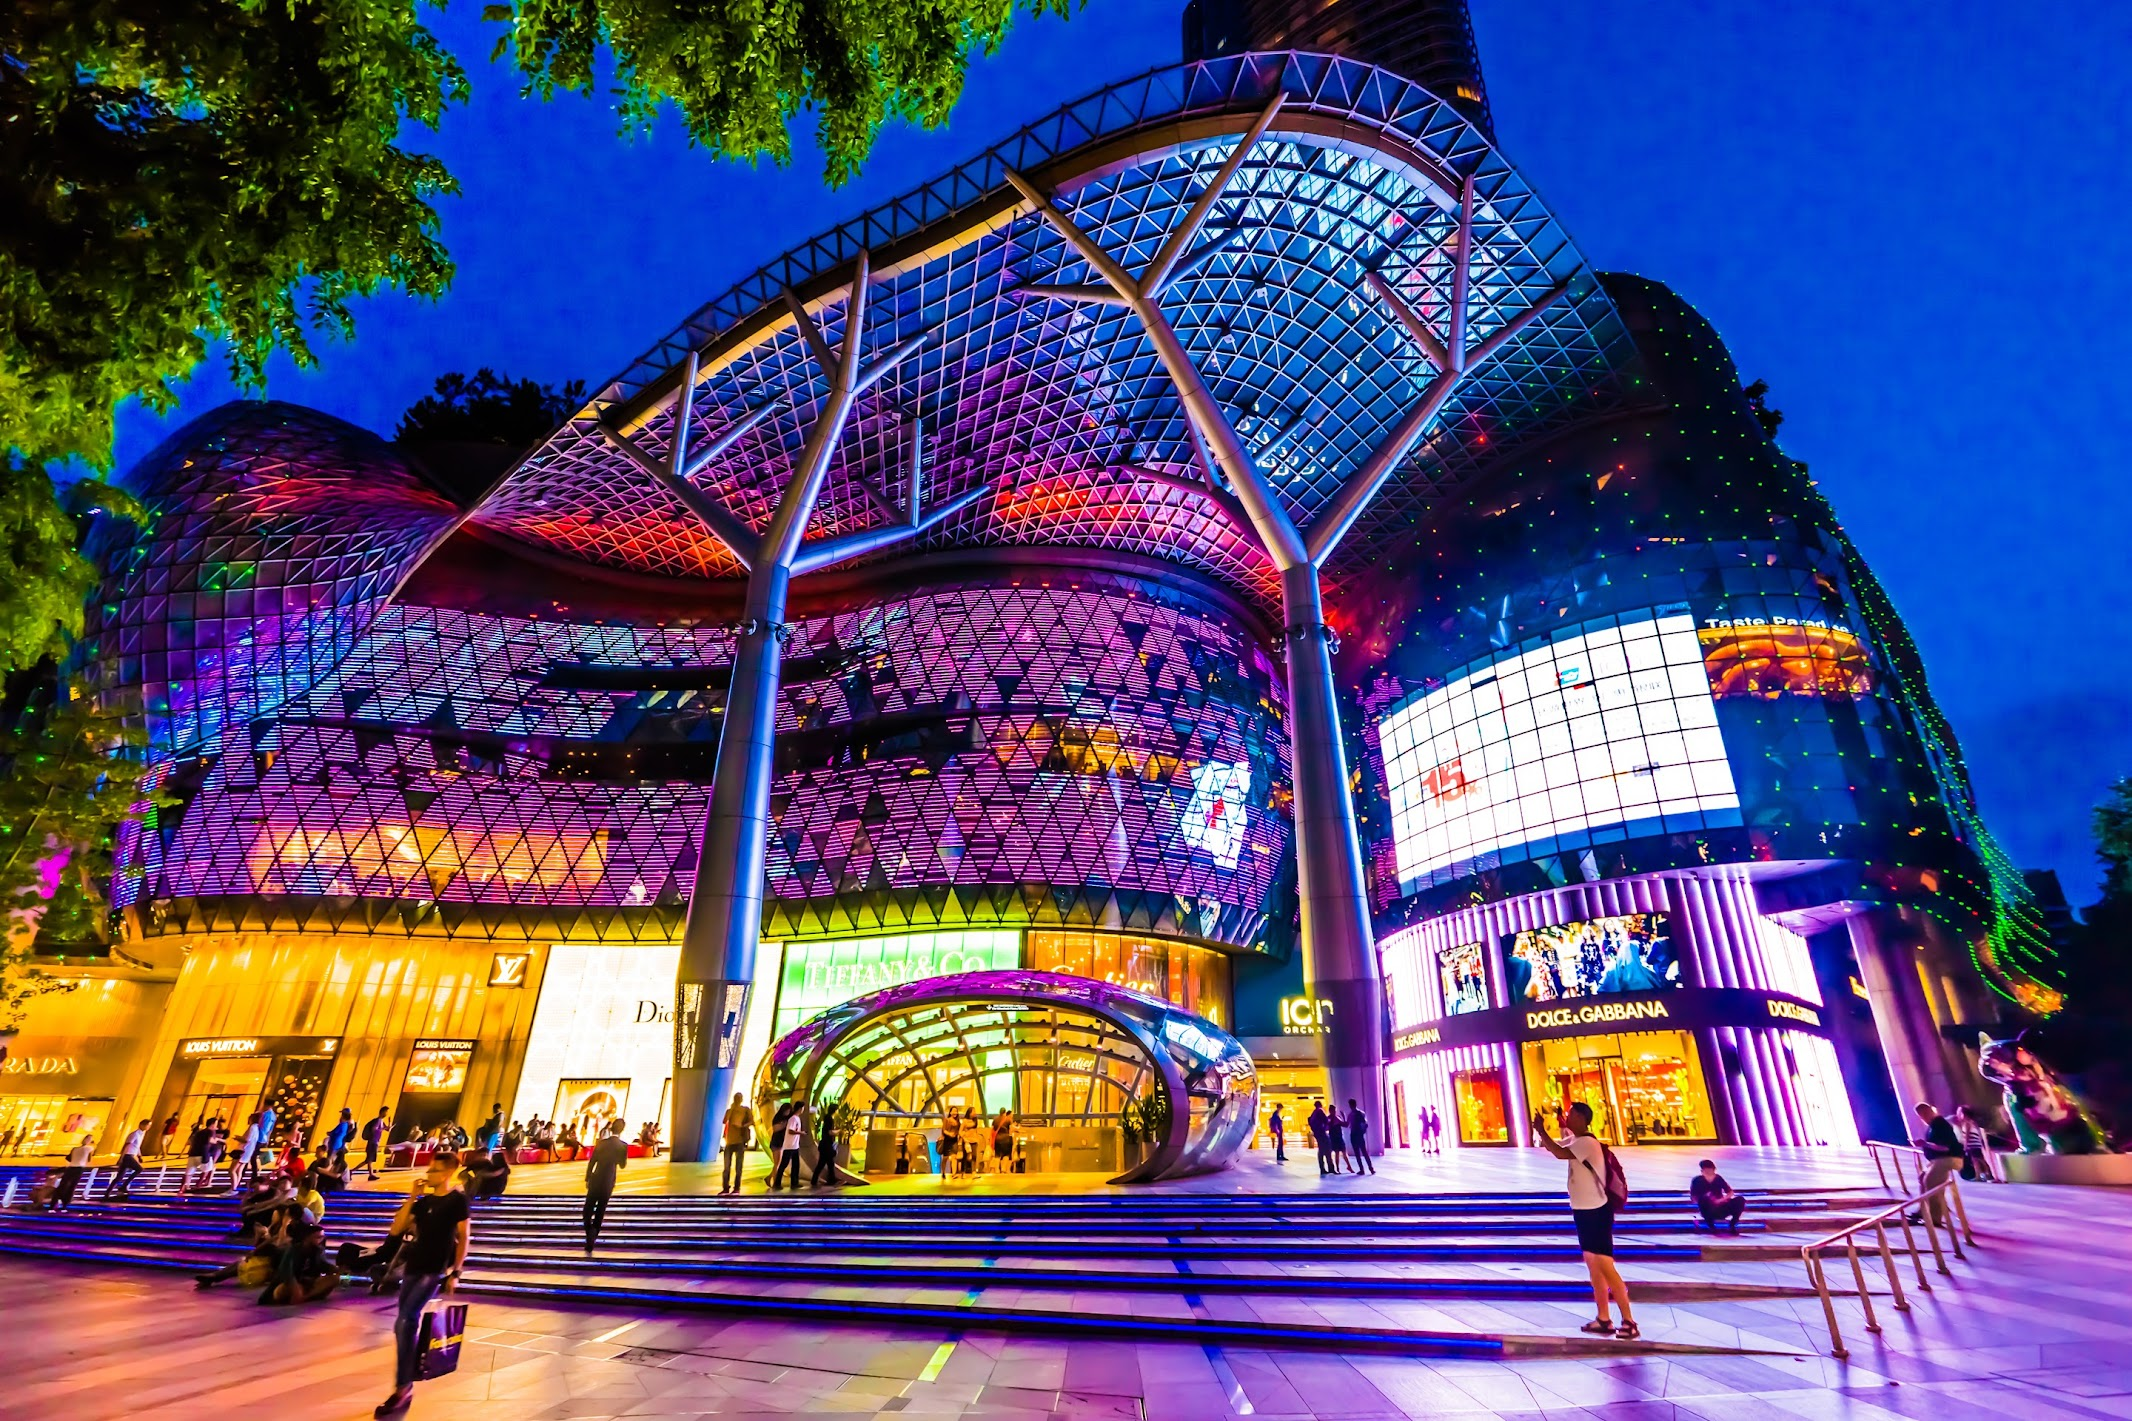 Singapore ION Orchard night view illumination1